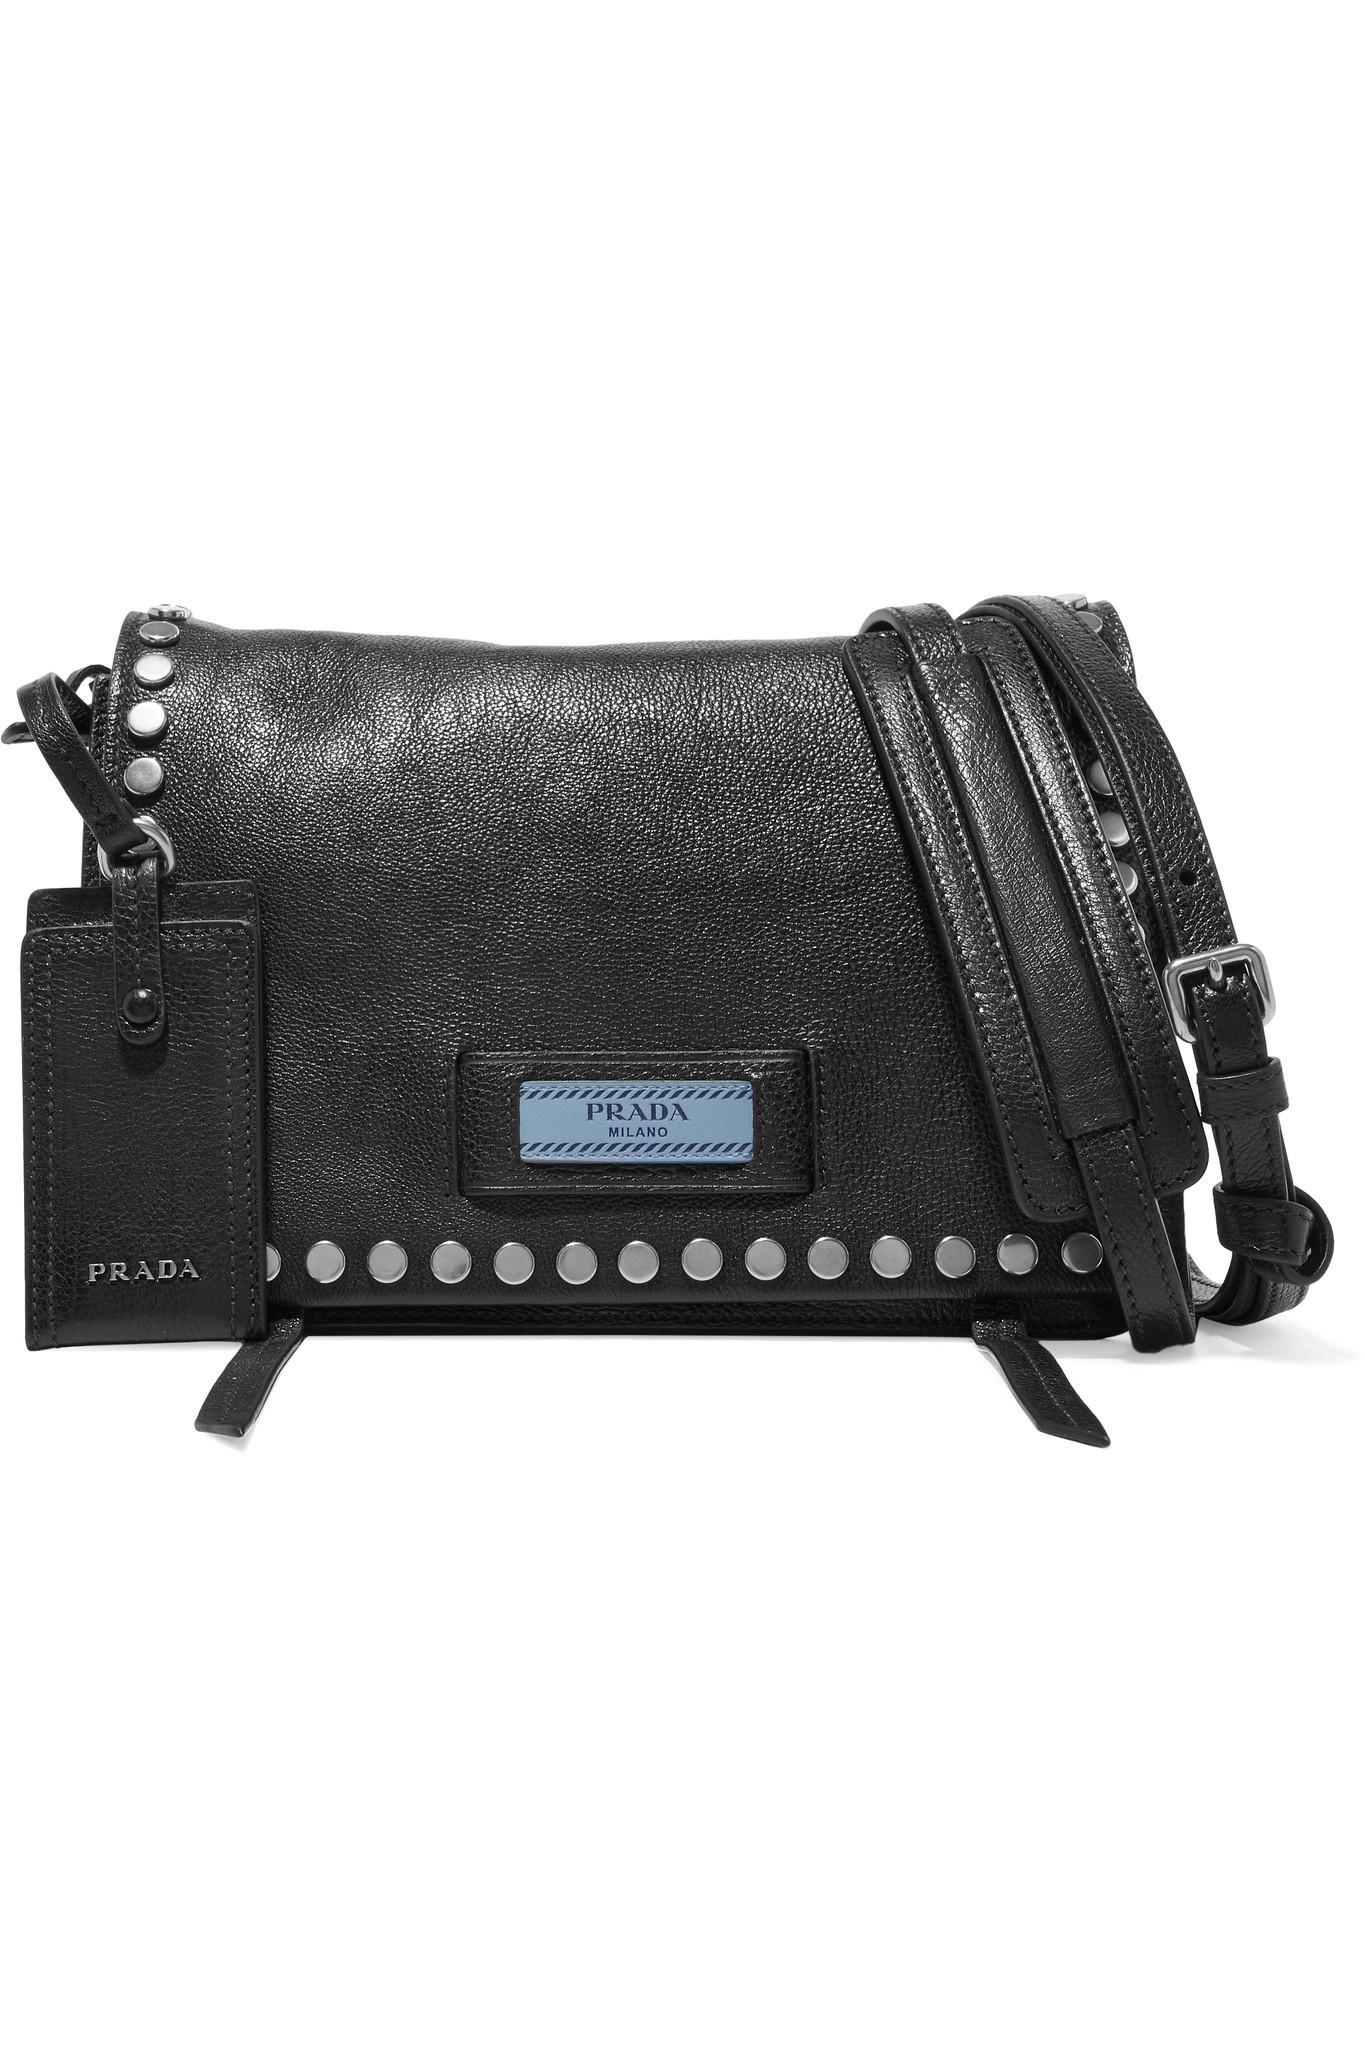 4a564fda22 Prada. Women s Black Etiquette Small Studded Textured-leather Shoulder Bag